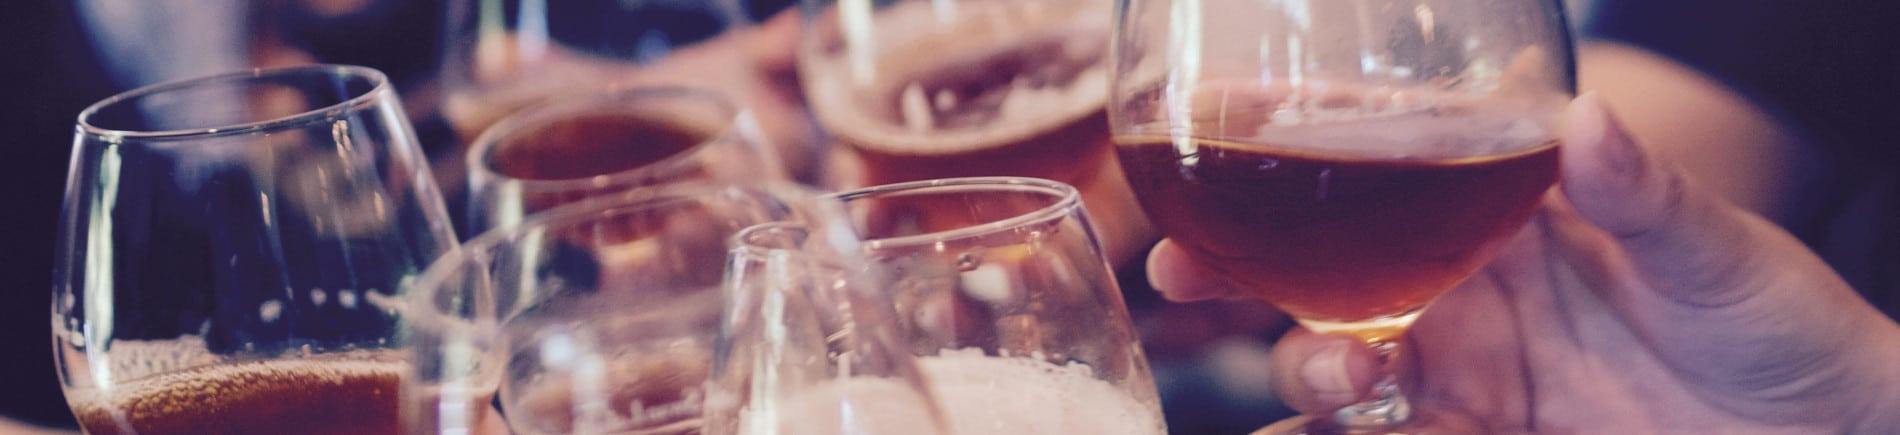 British Guild of Beer Writers' Awards